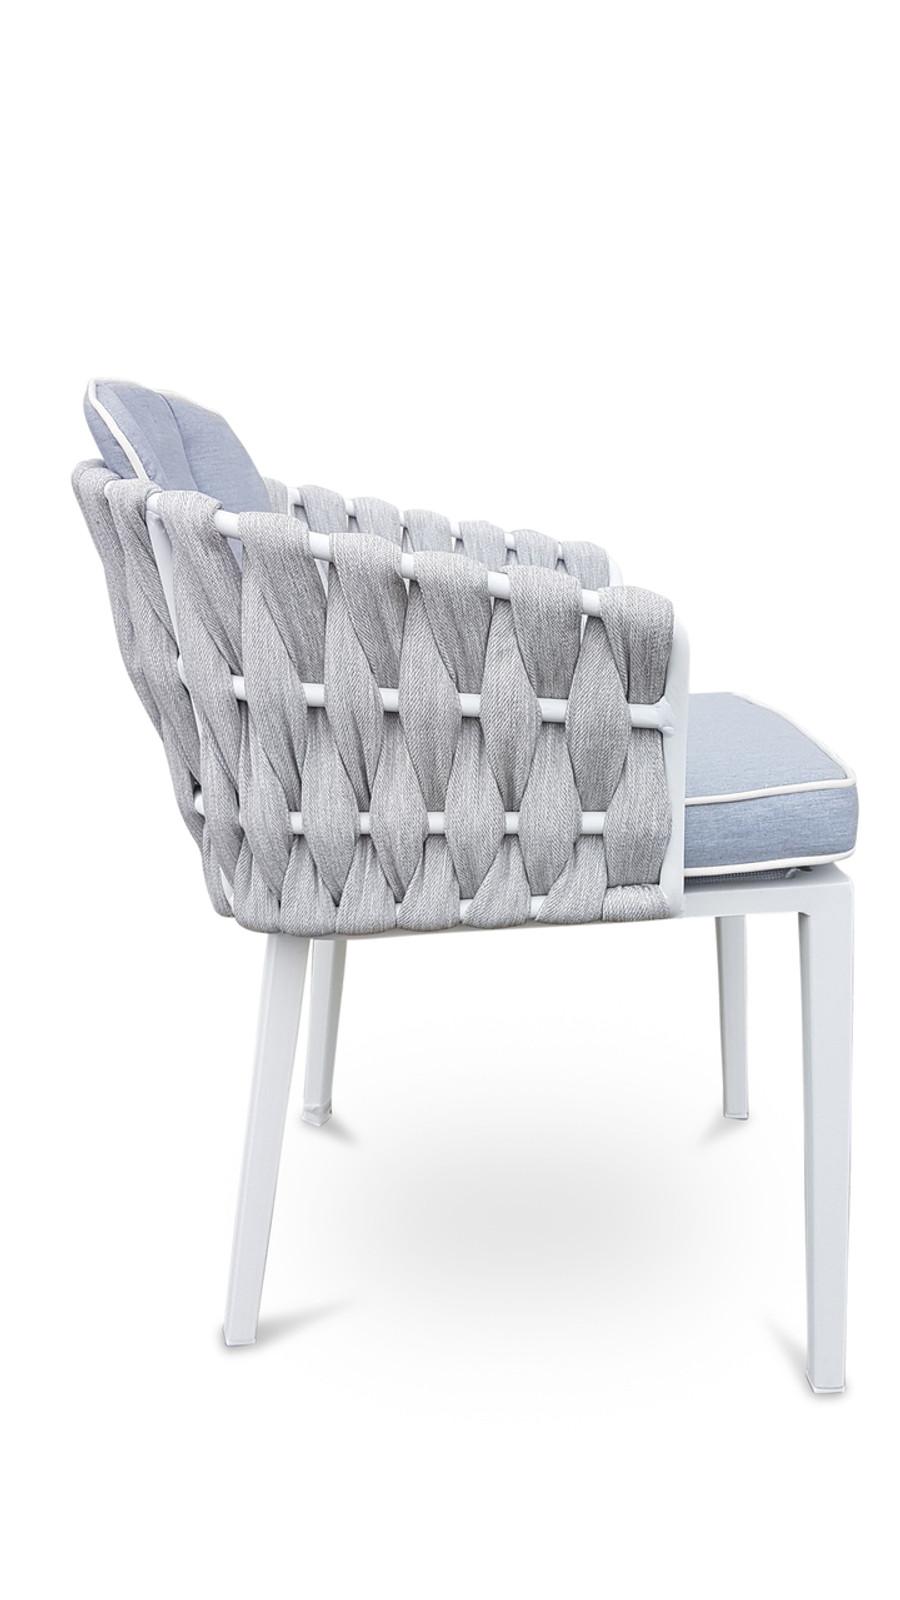 ZEN Outdoor Strap & Aluminium Dining Arm Chair